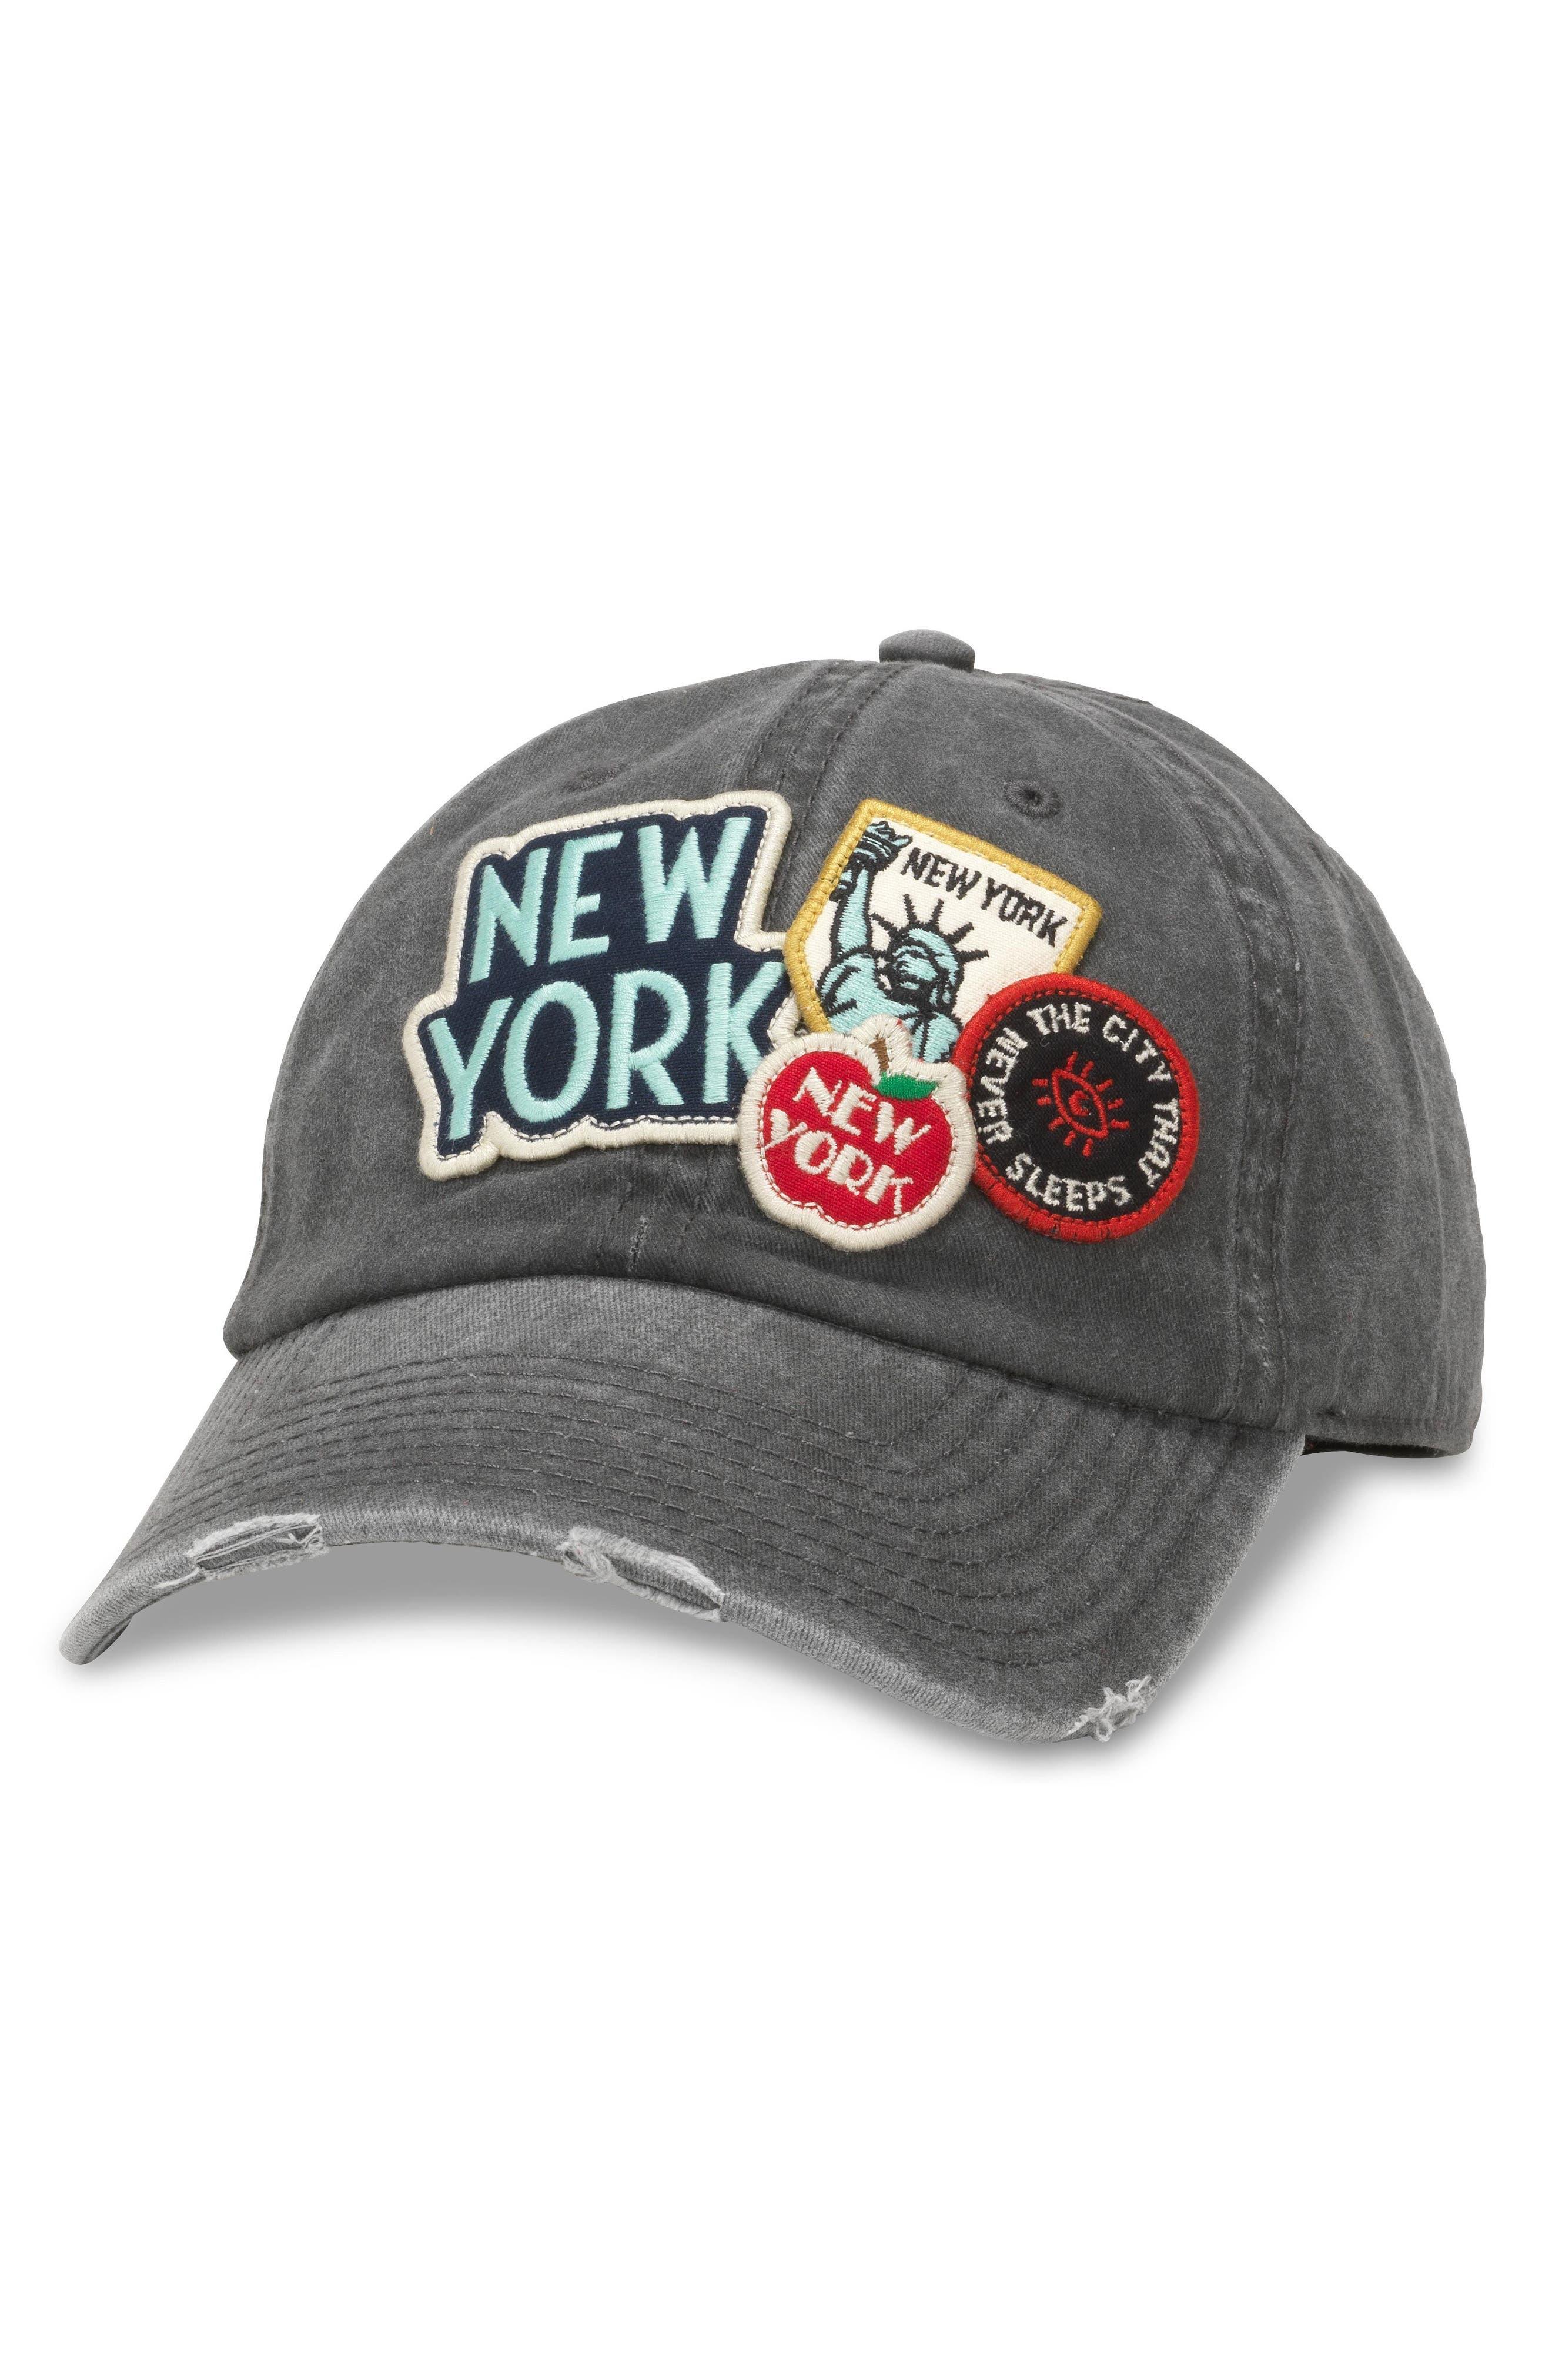 Main Image - American Needle Iconic - New York Ball Cap